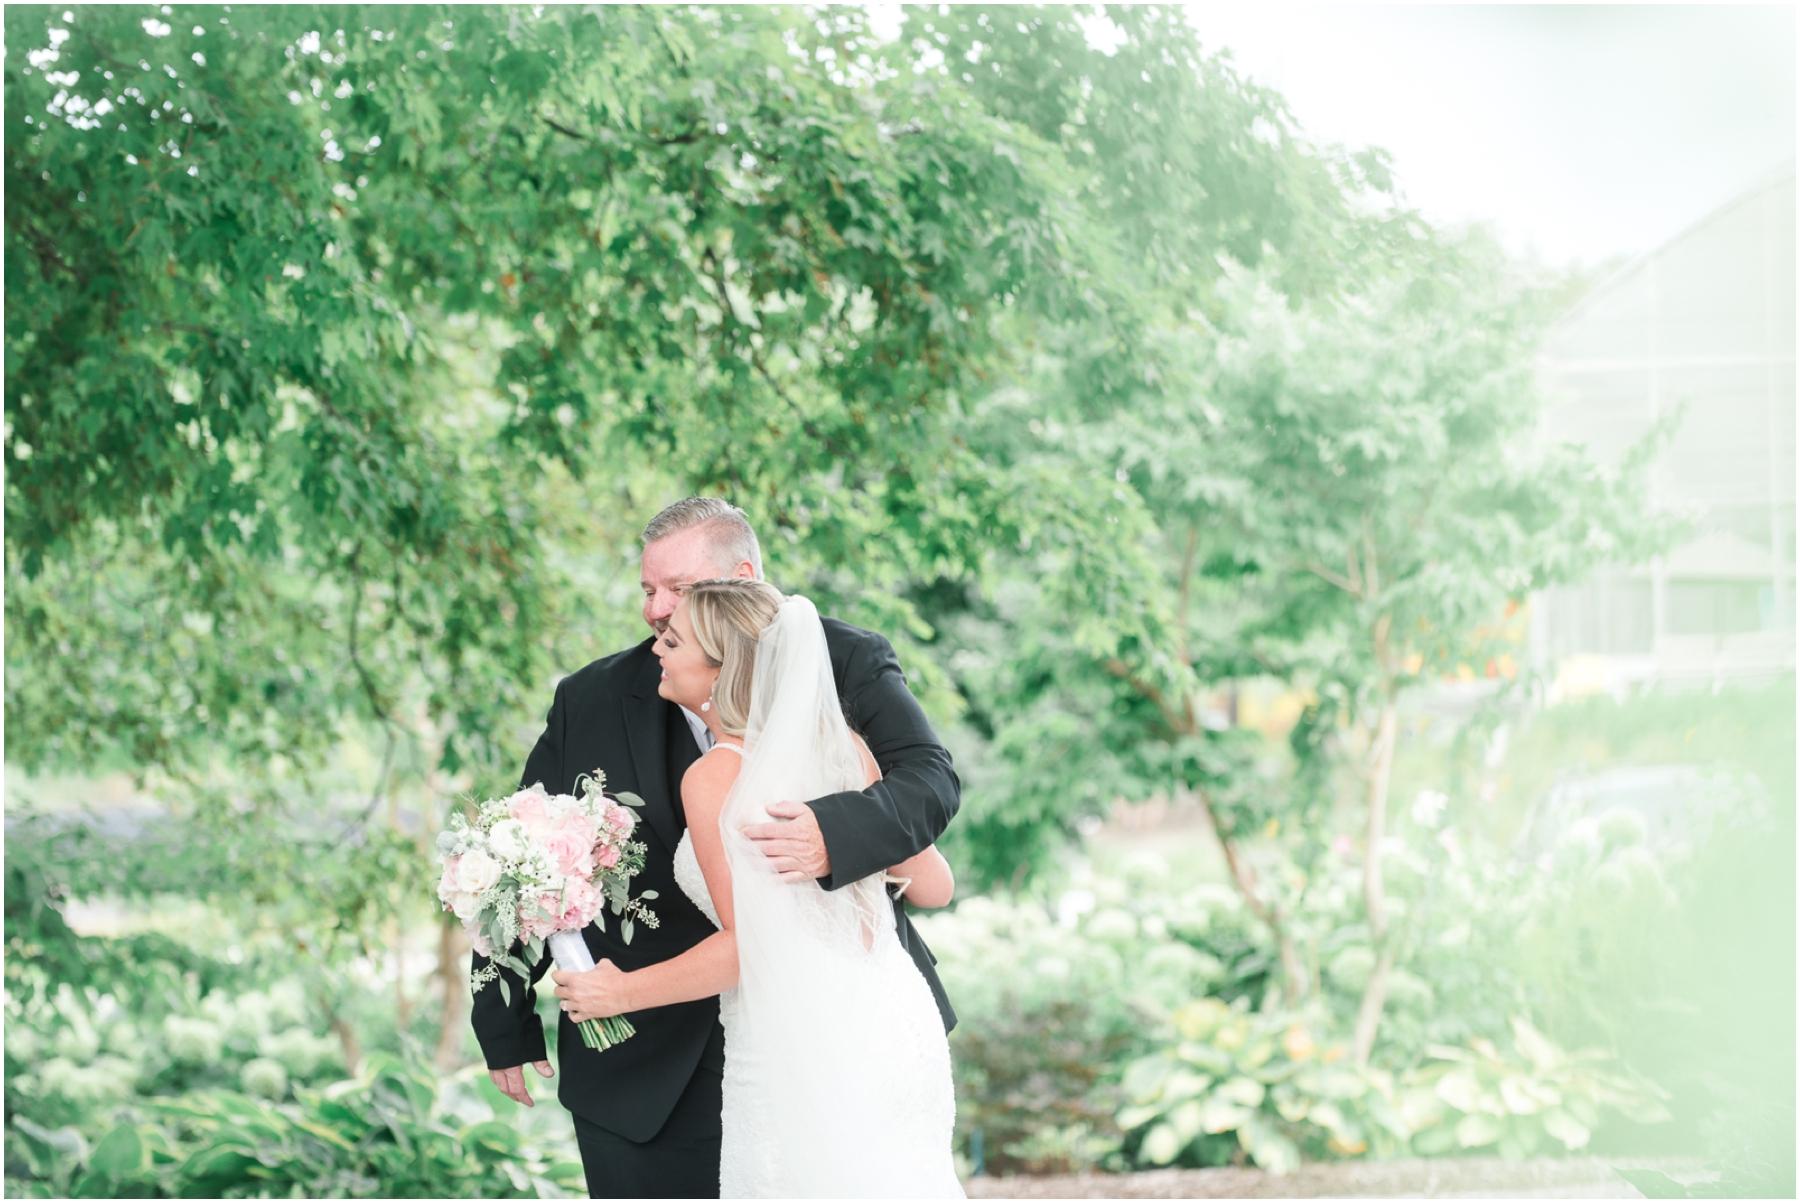 Bloom Field Gardens Wedding Precious Photography Katherine & Chris_023